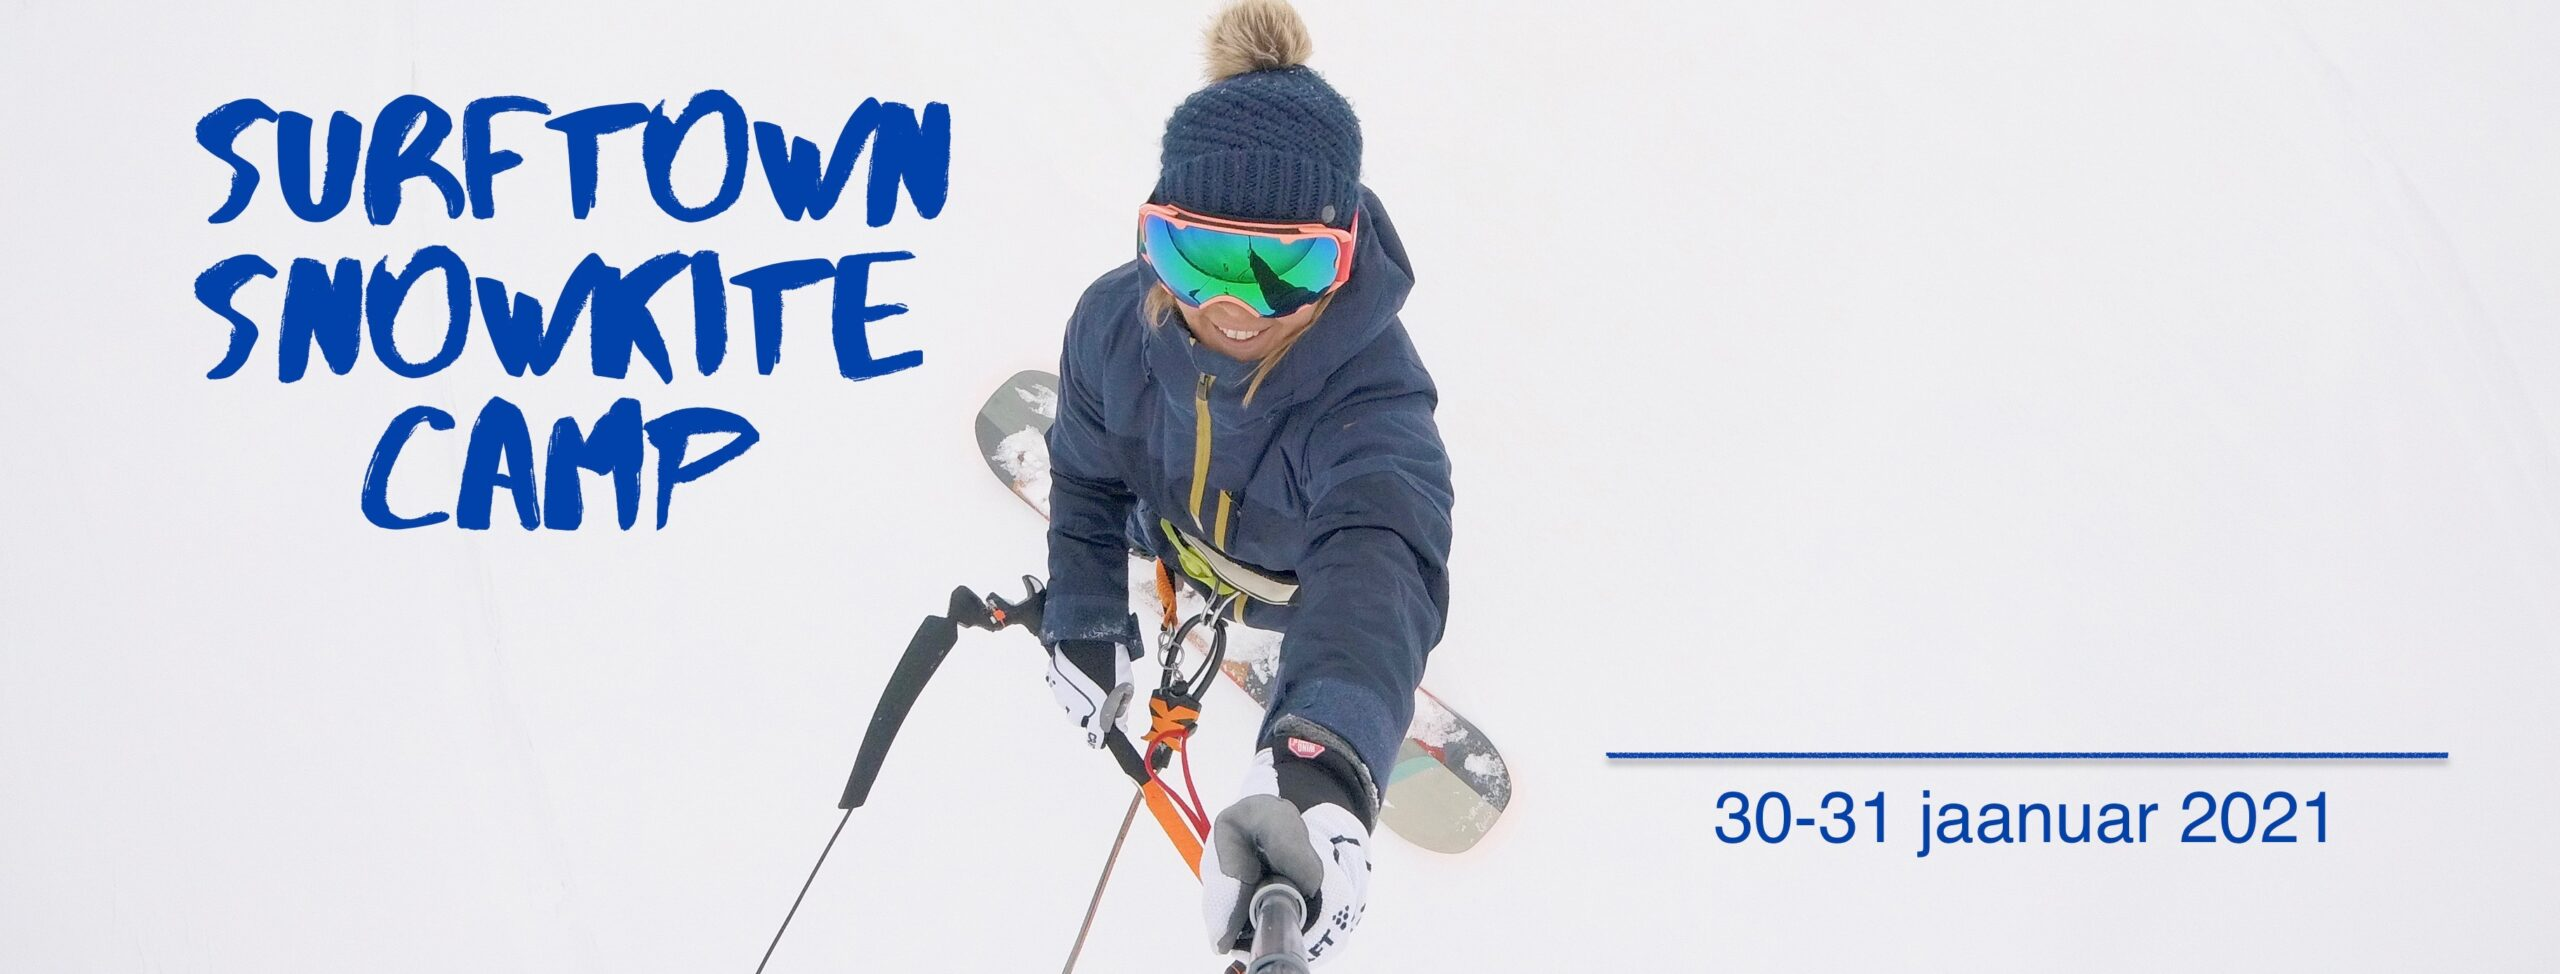 Snowkite Camp Jaanuar